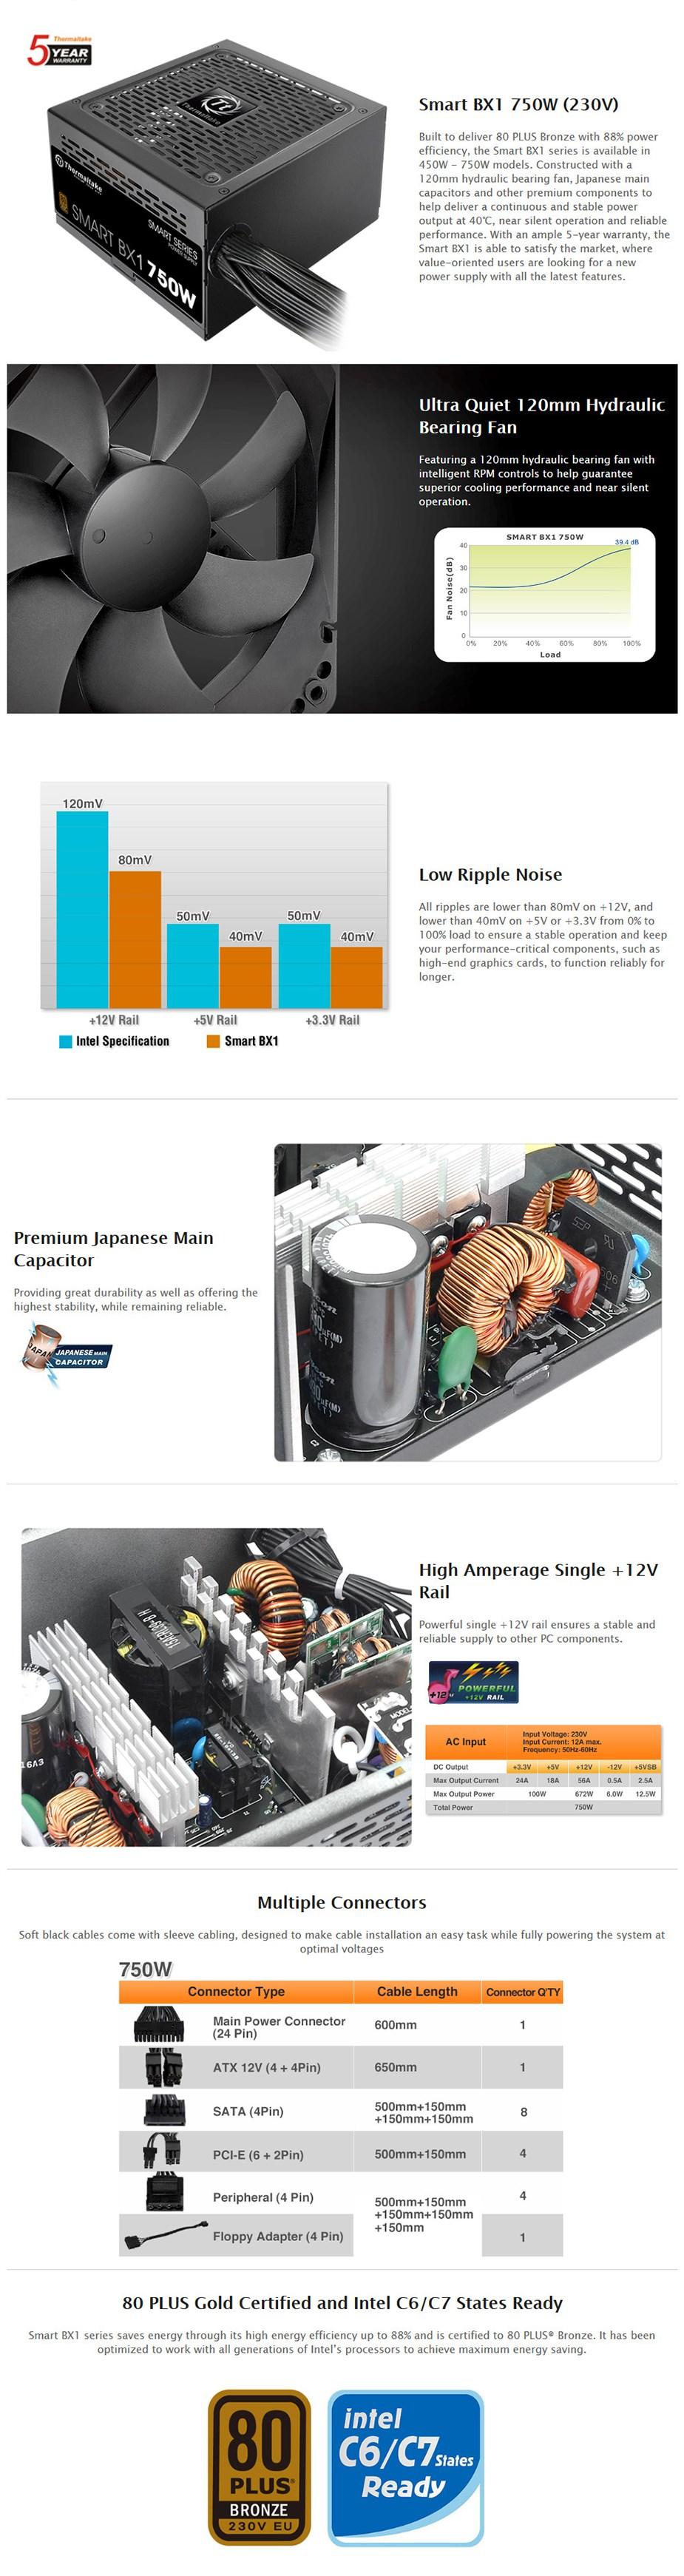 Thermaltake Smart BX1 230V 750W 80+ Bronze Non Modular Power Supply - Desktop Overview 1